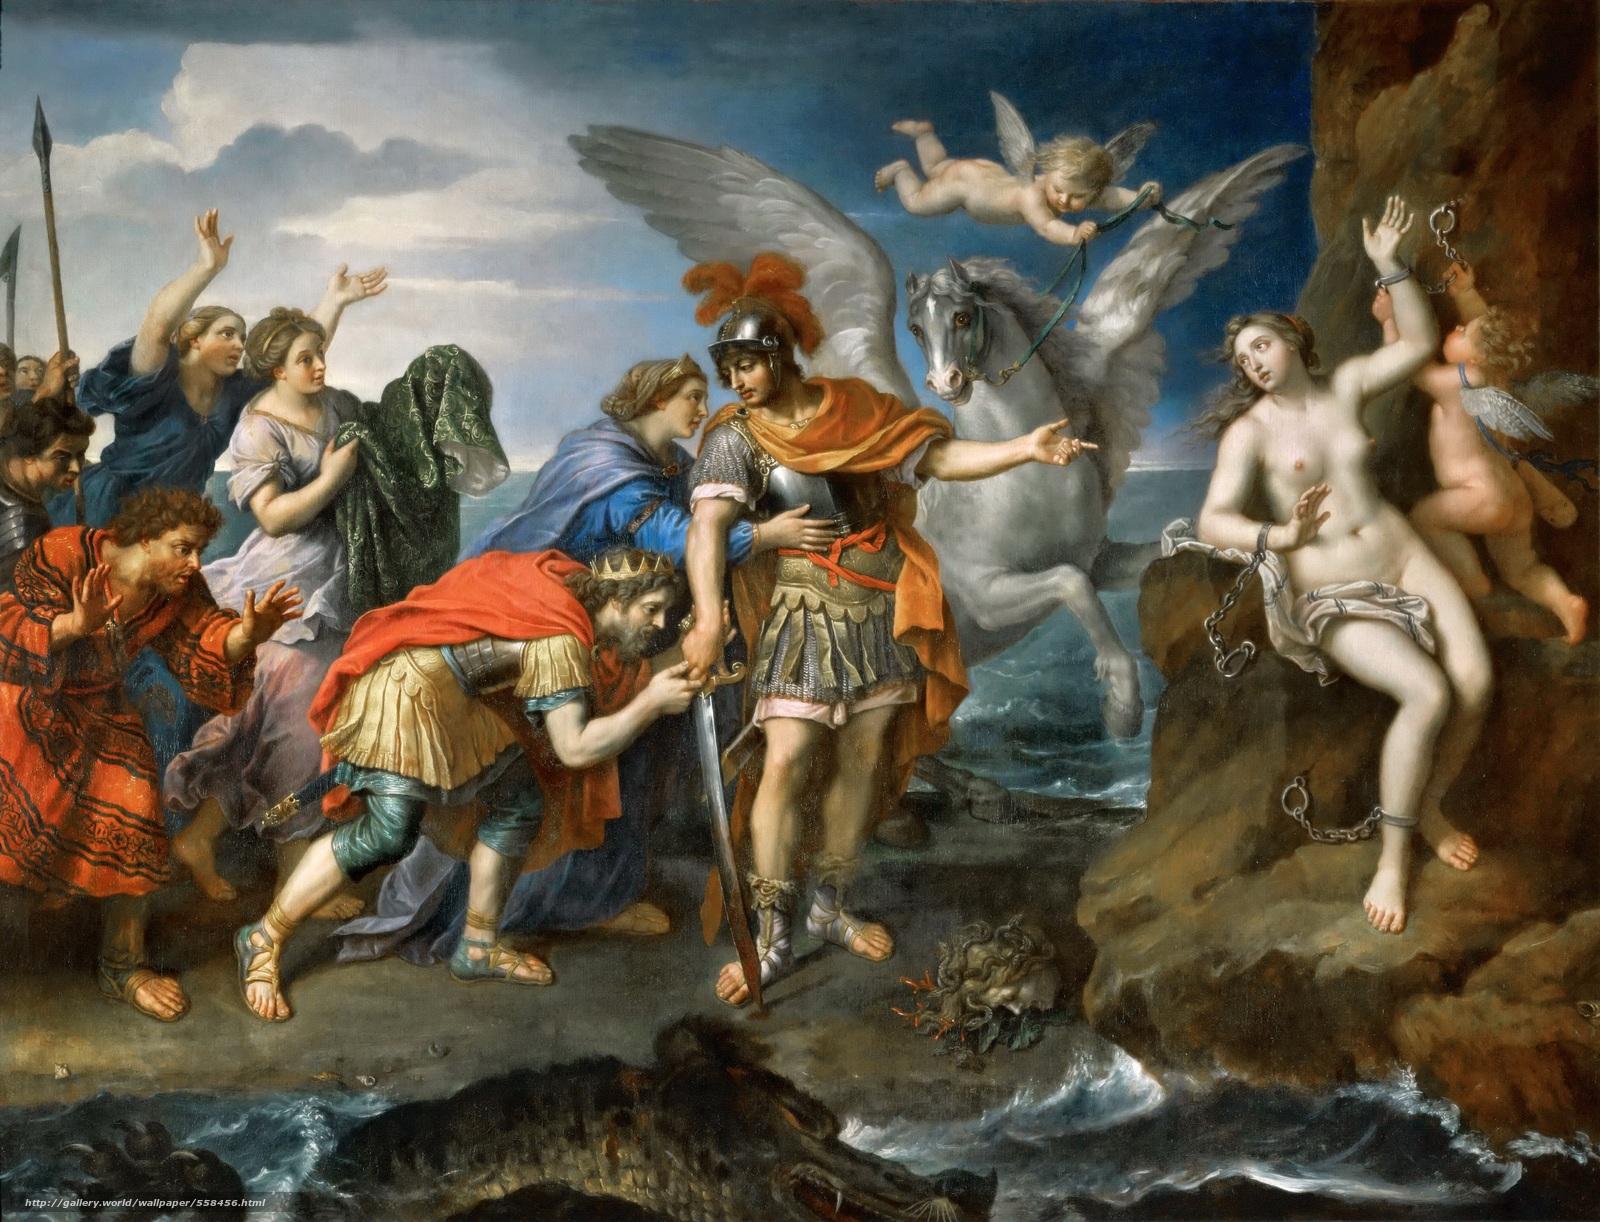 Download wallpaper Mignard Pierre Perseus and Andromeda